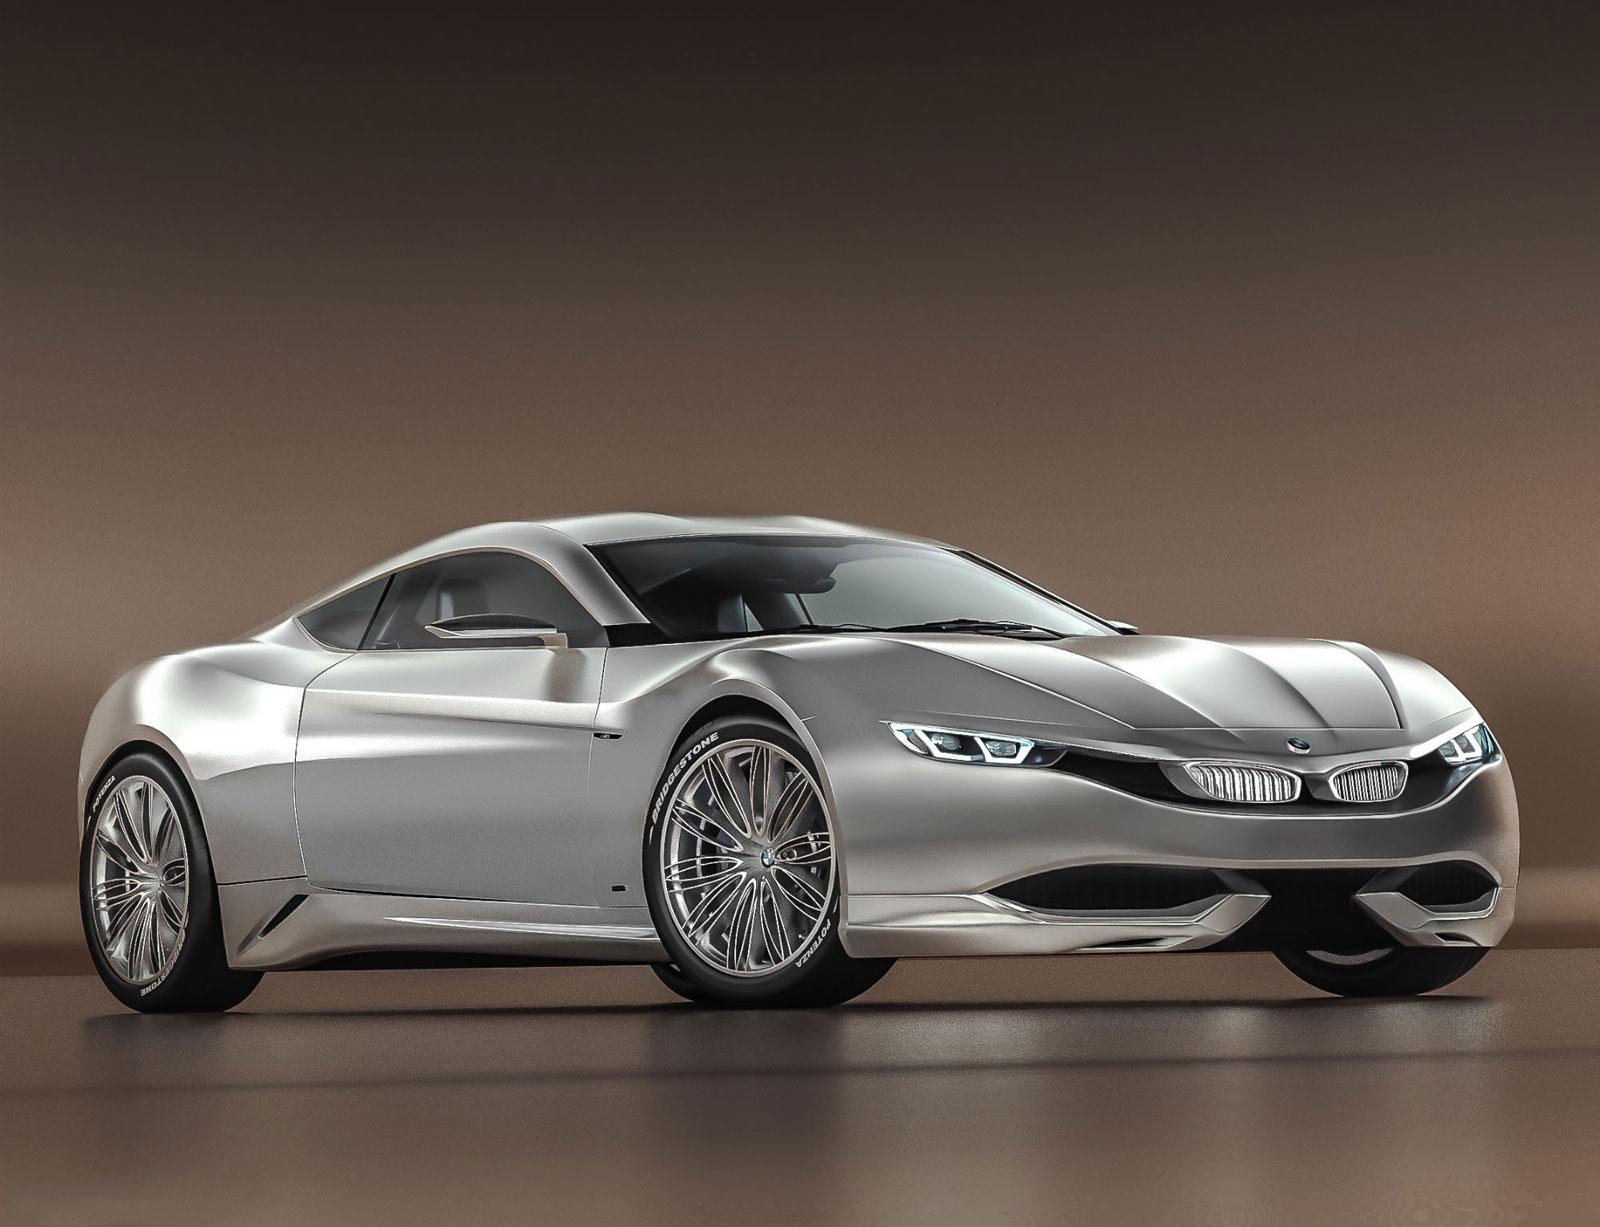 Bmw M9 Concept Car Body Design 219067 On Wookmark